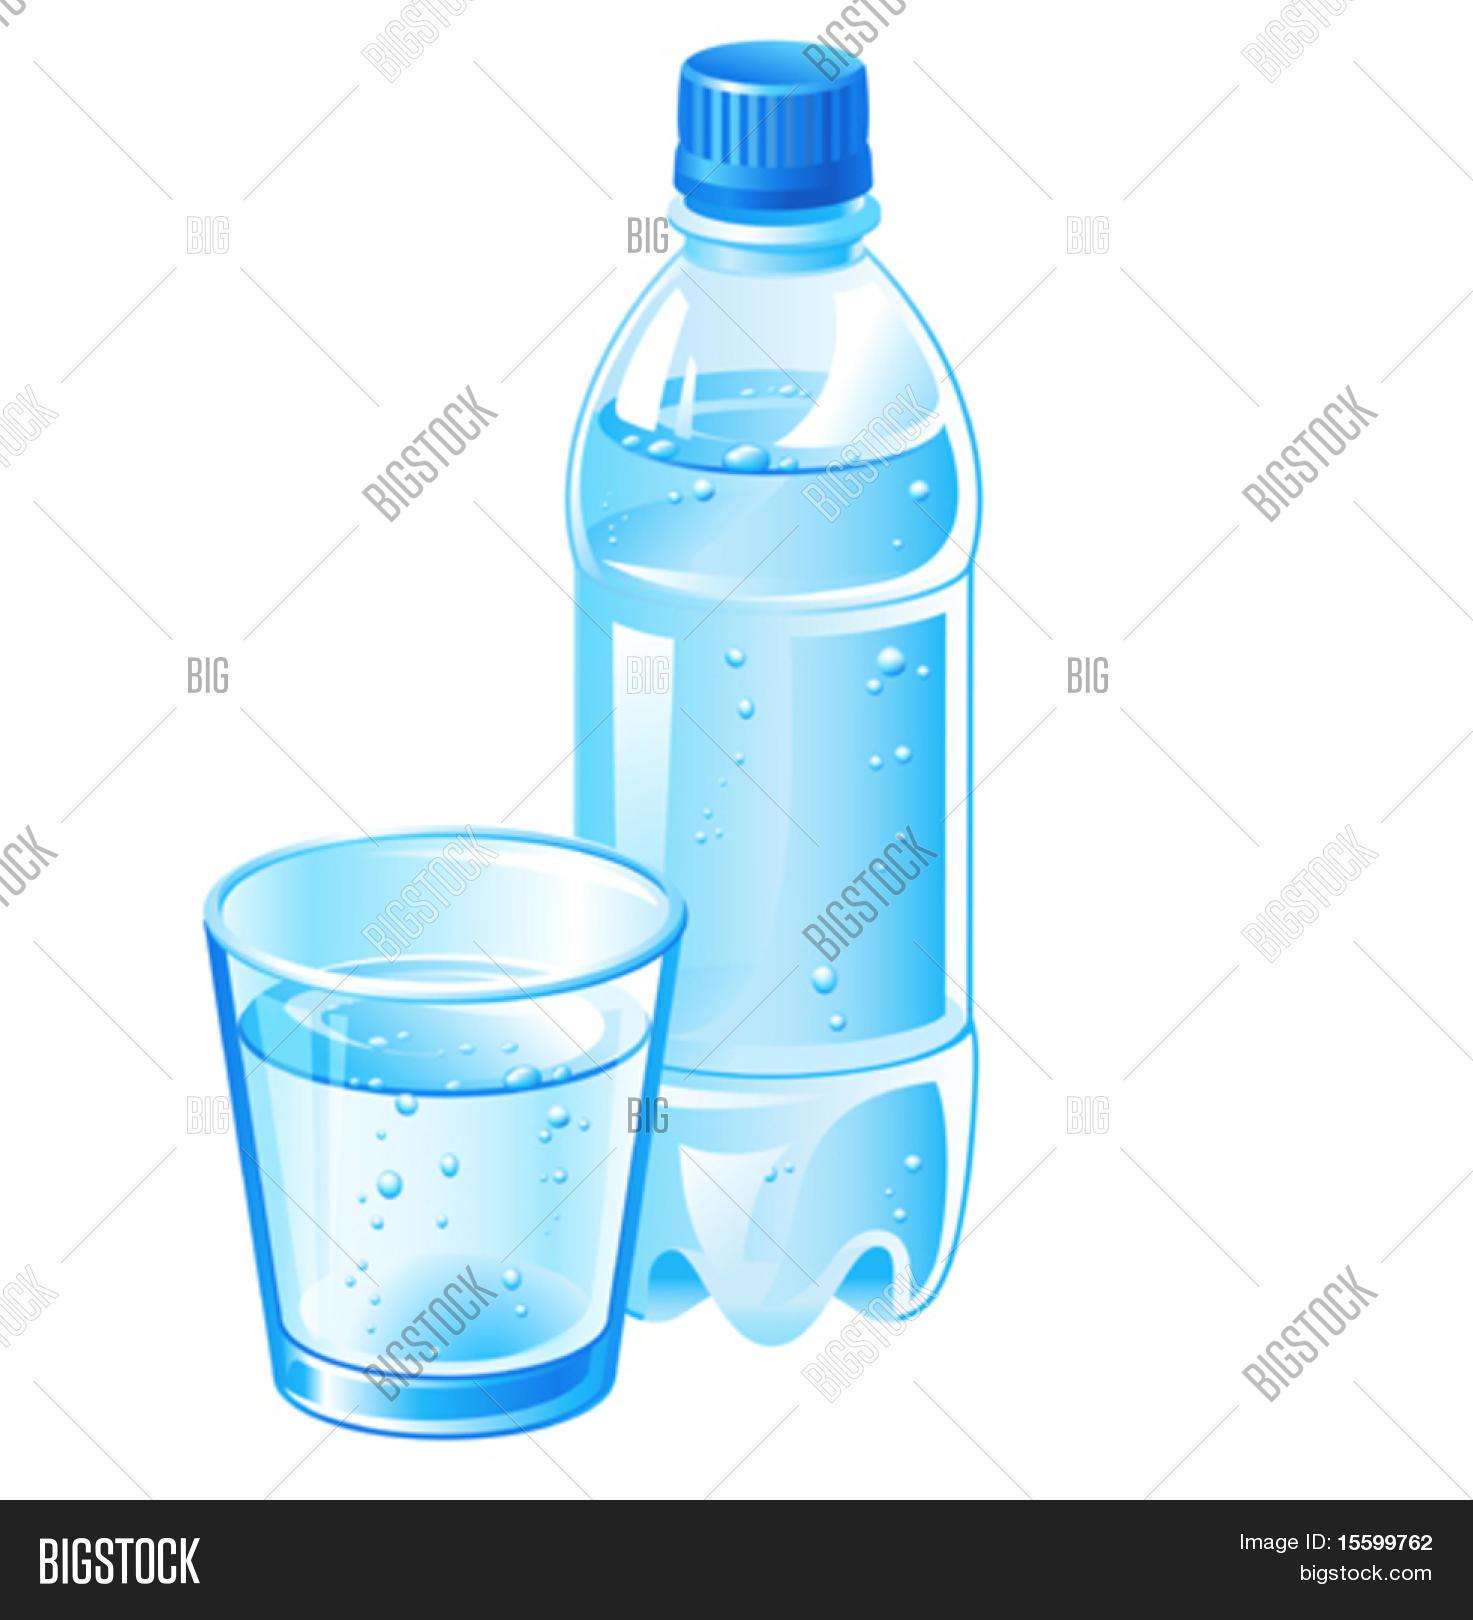 Caricaturas con vasos de agua pictures to pin on pinterest - Vaso con agua ...